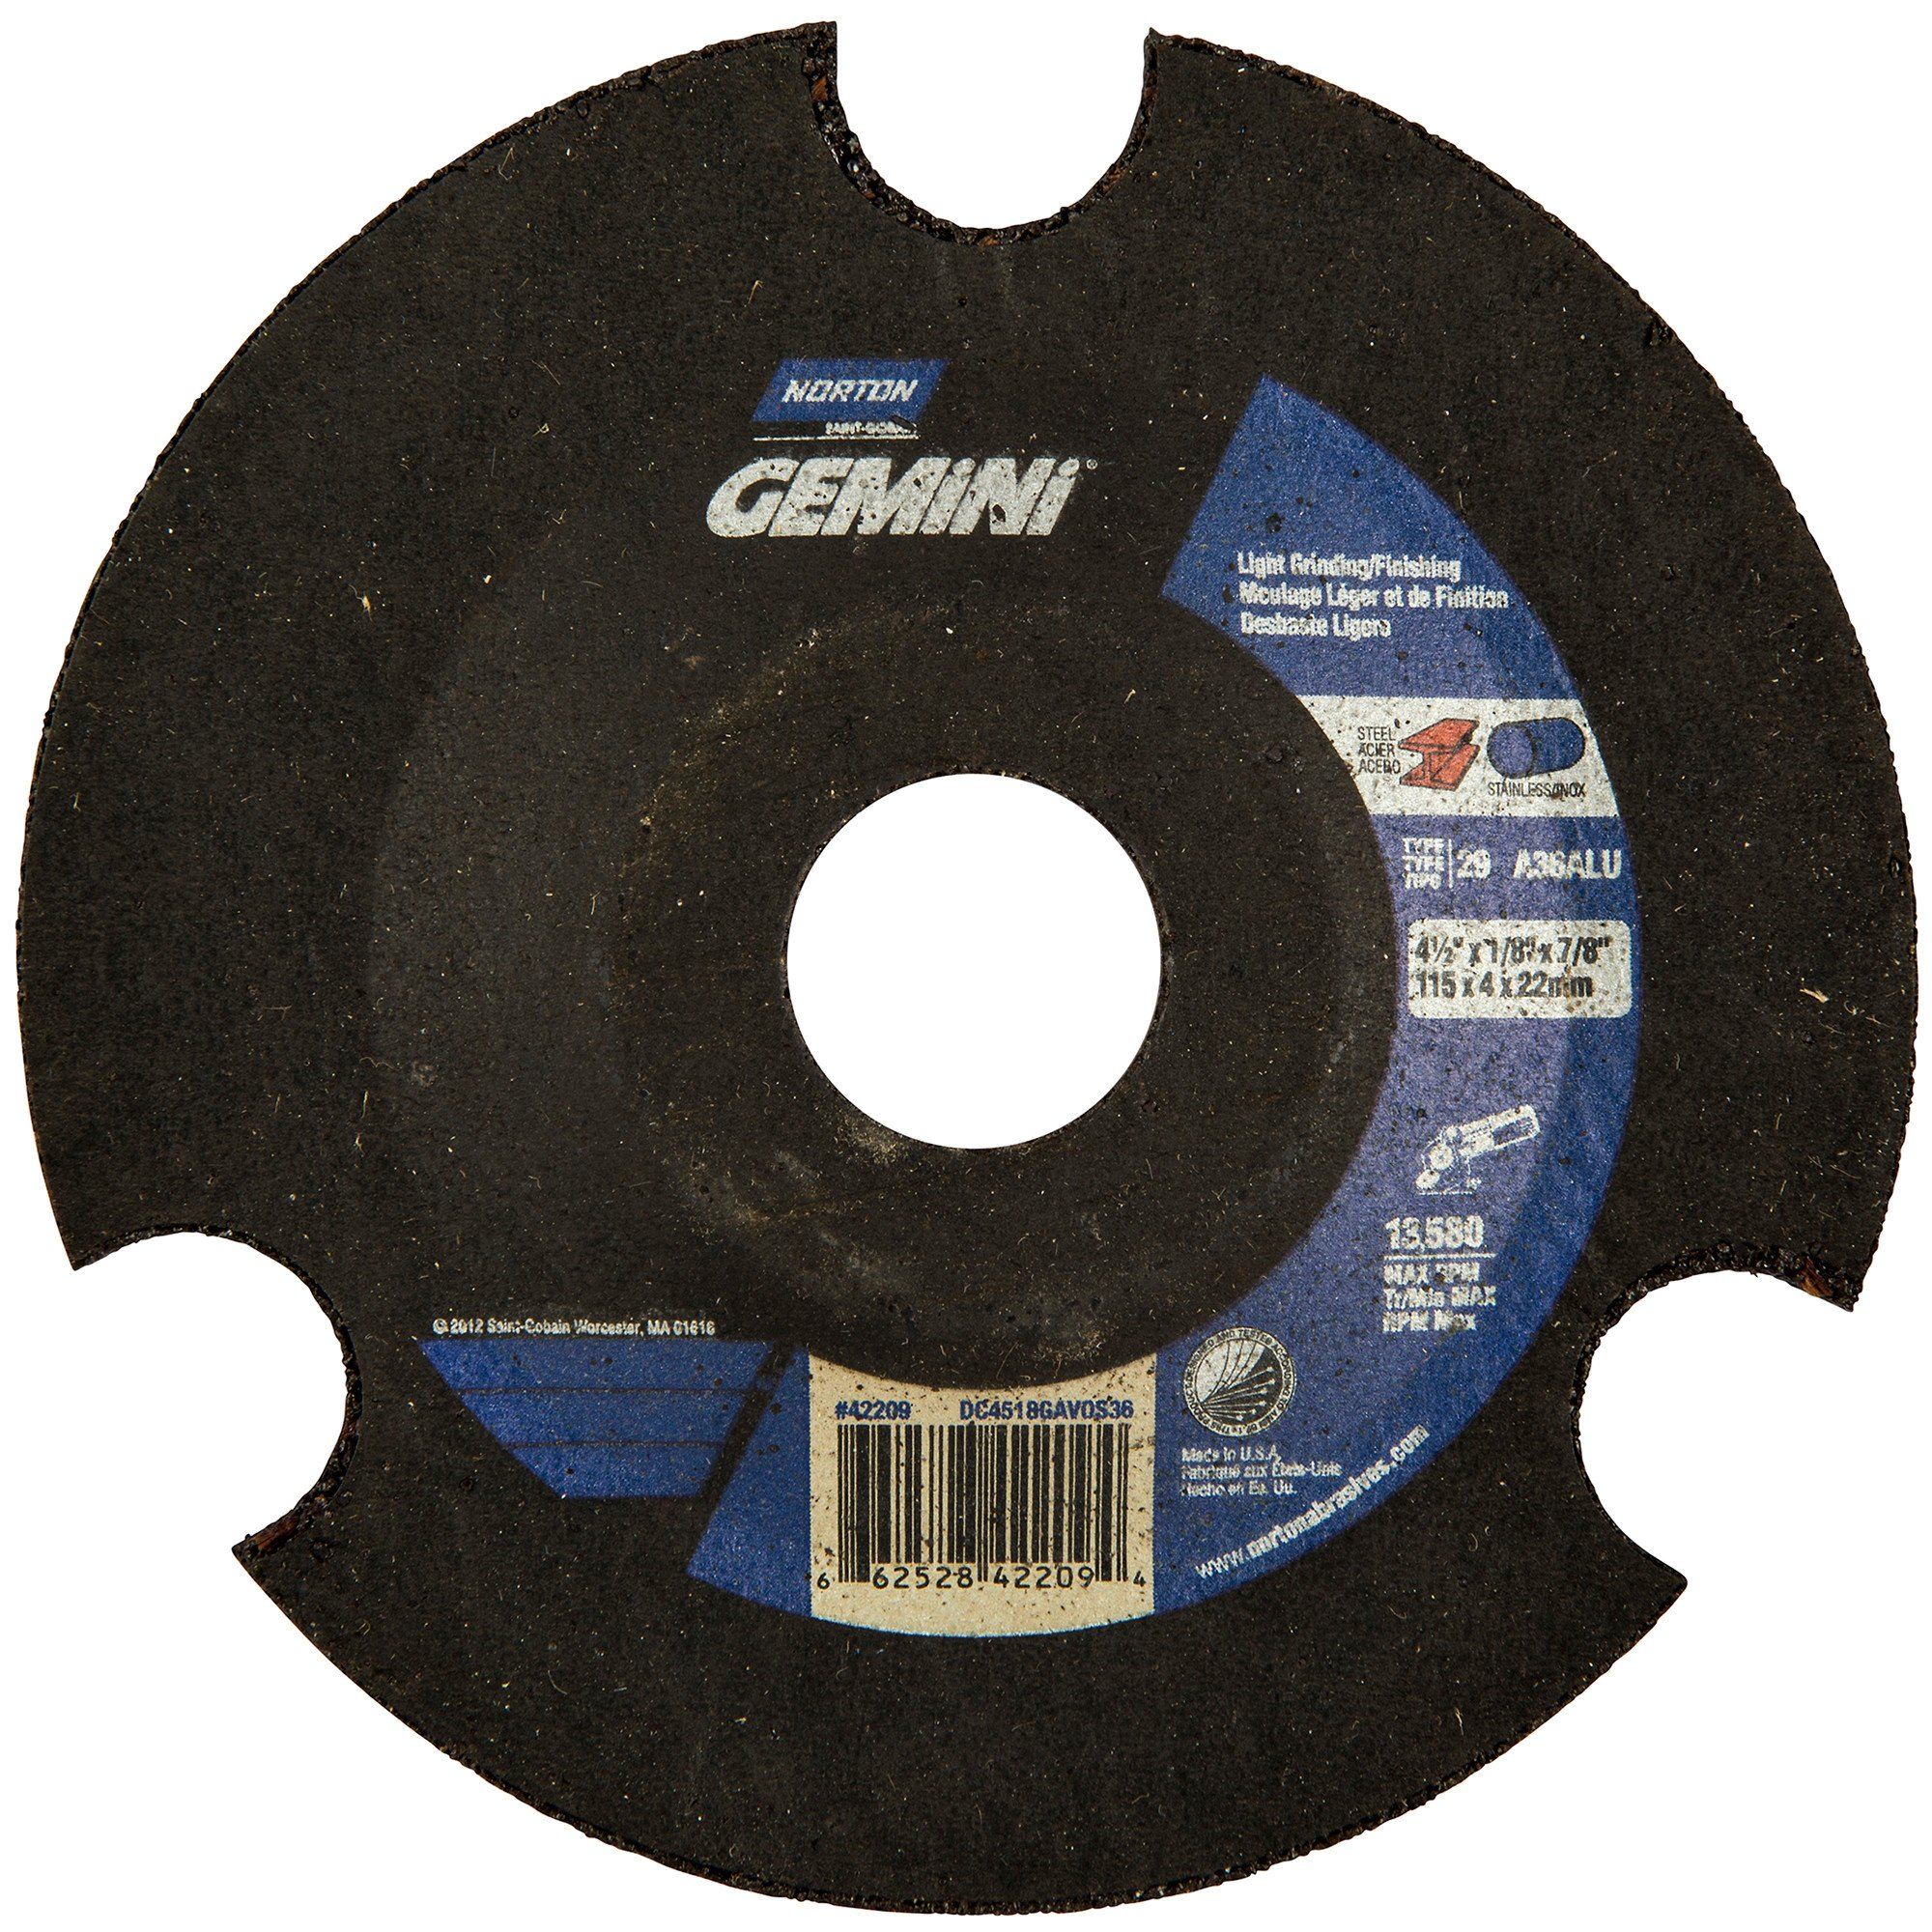 Norton Charger AVOS Depressed Center Abrasive Wheel, Type 29, Aluminum Oxide, 7/8'' Arbor, 4-1/2'' Diameter x 1/8'' Thickness, Grit 36 (Pack of 25)